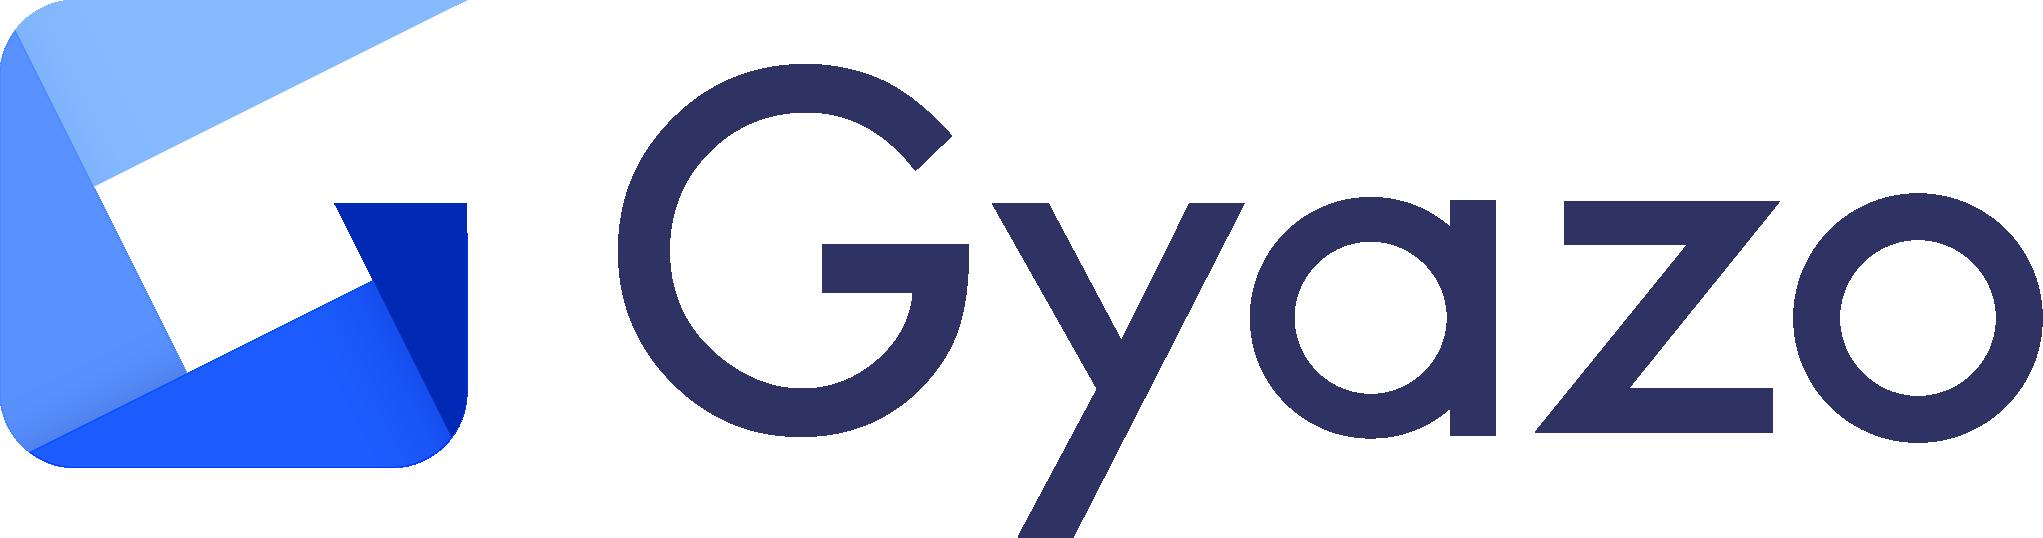 Gyazo_logo